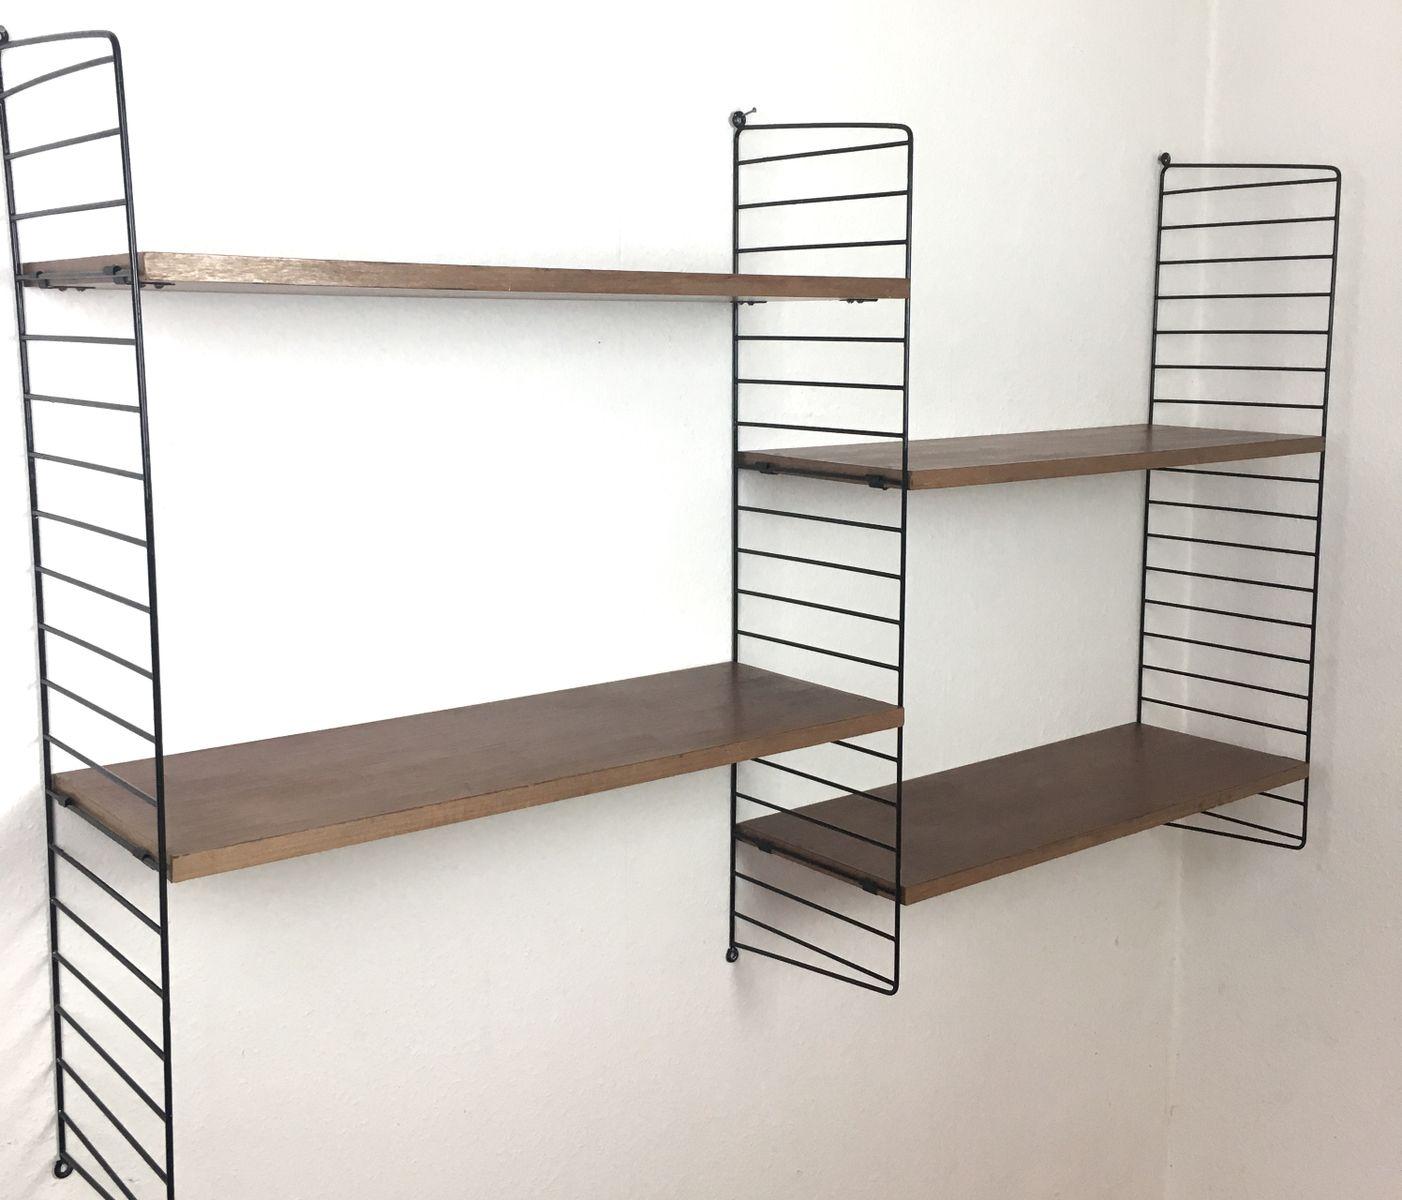 Nisse Strinning mid century teak wall shelf by nisse strinning for string 1960s for